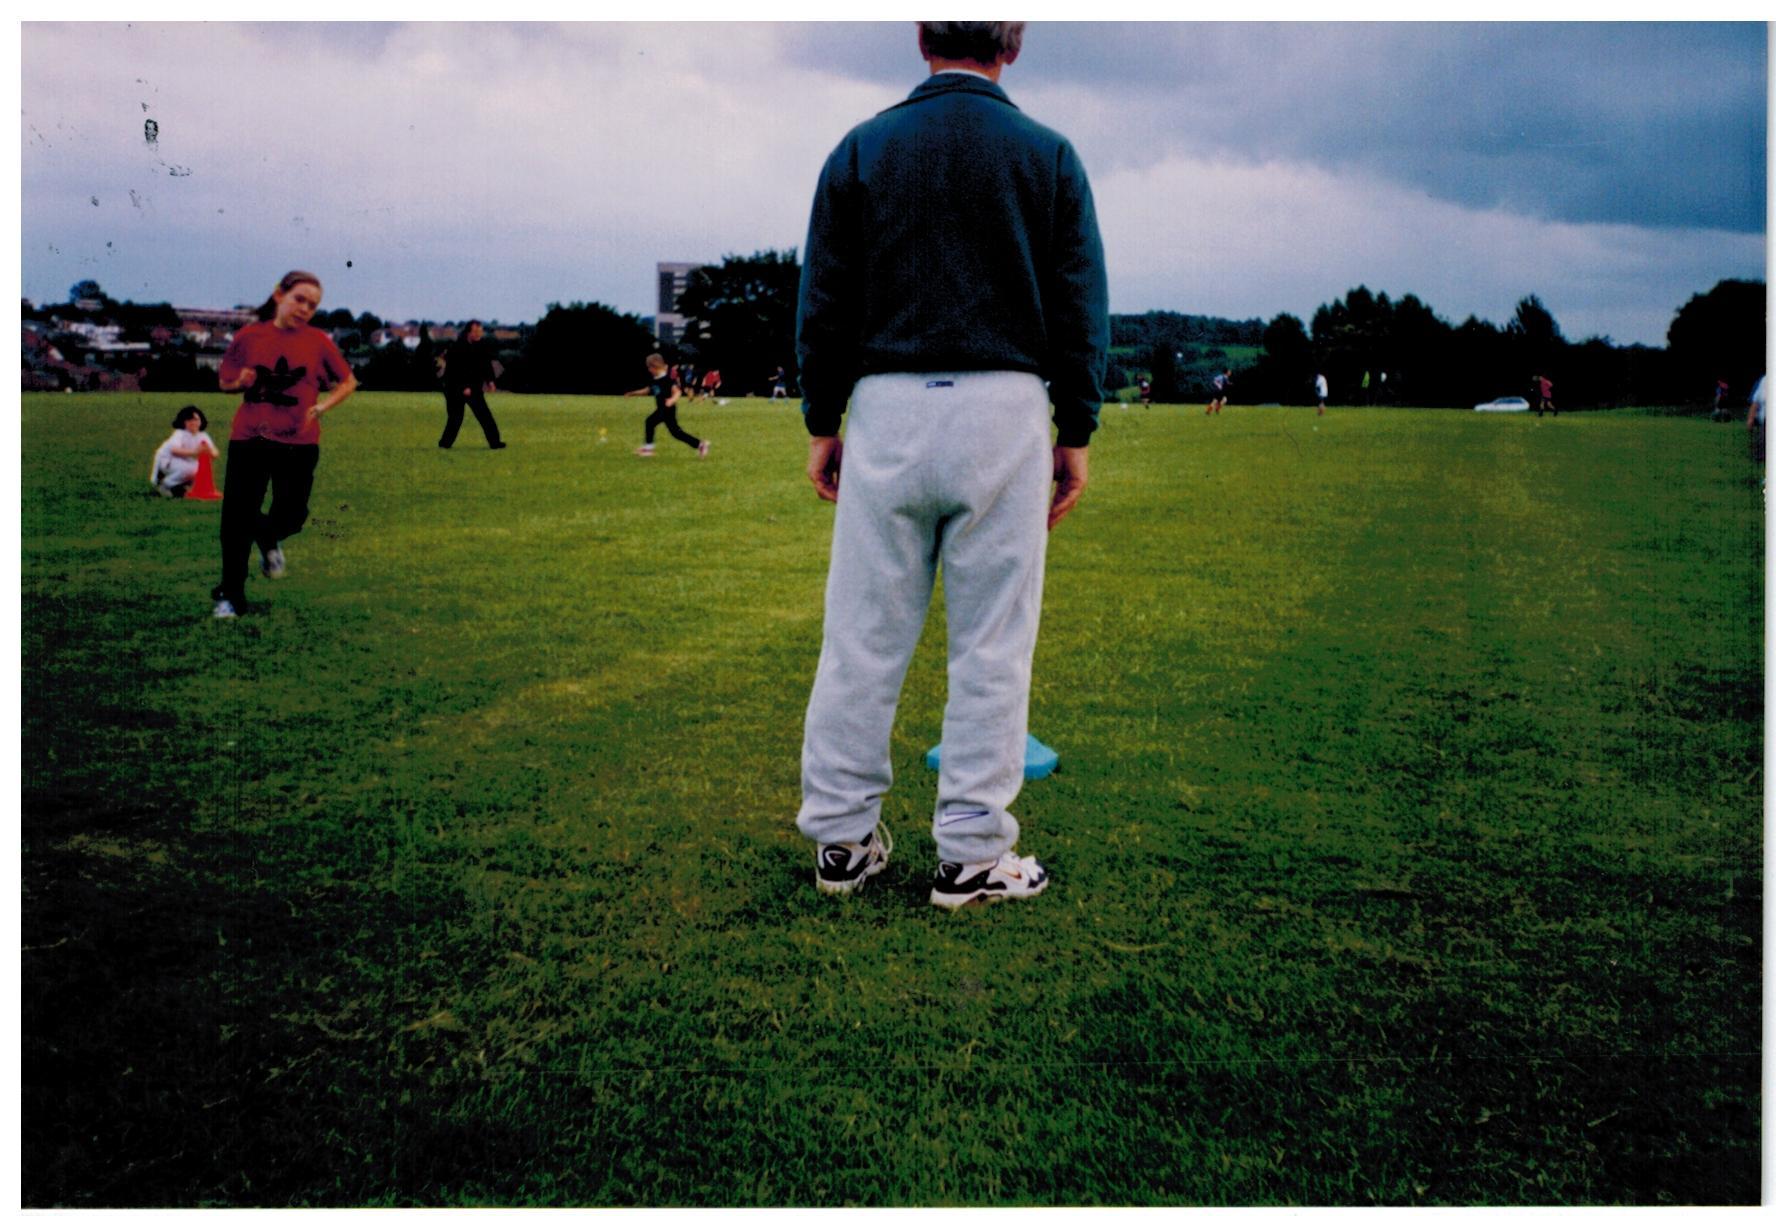 N106_Rounders_Homer-Hill_[15-07-1998]